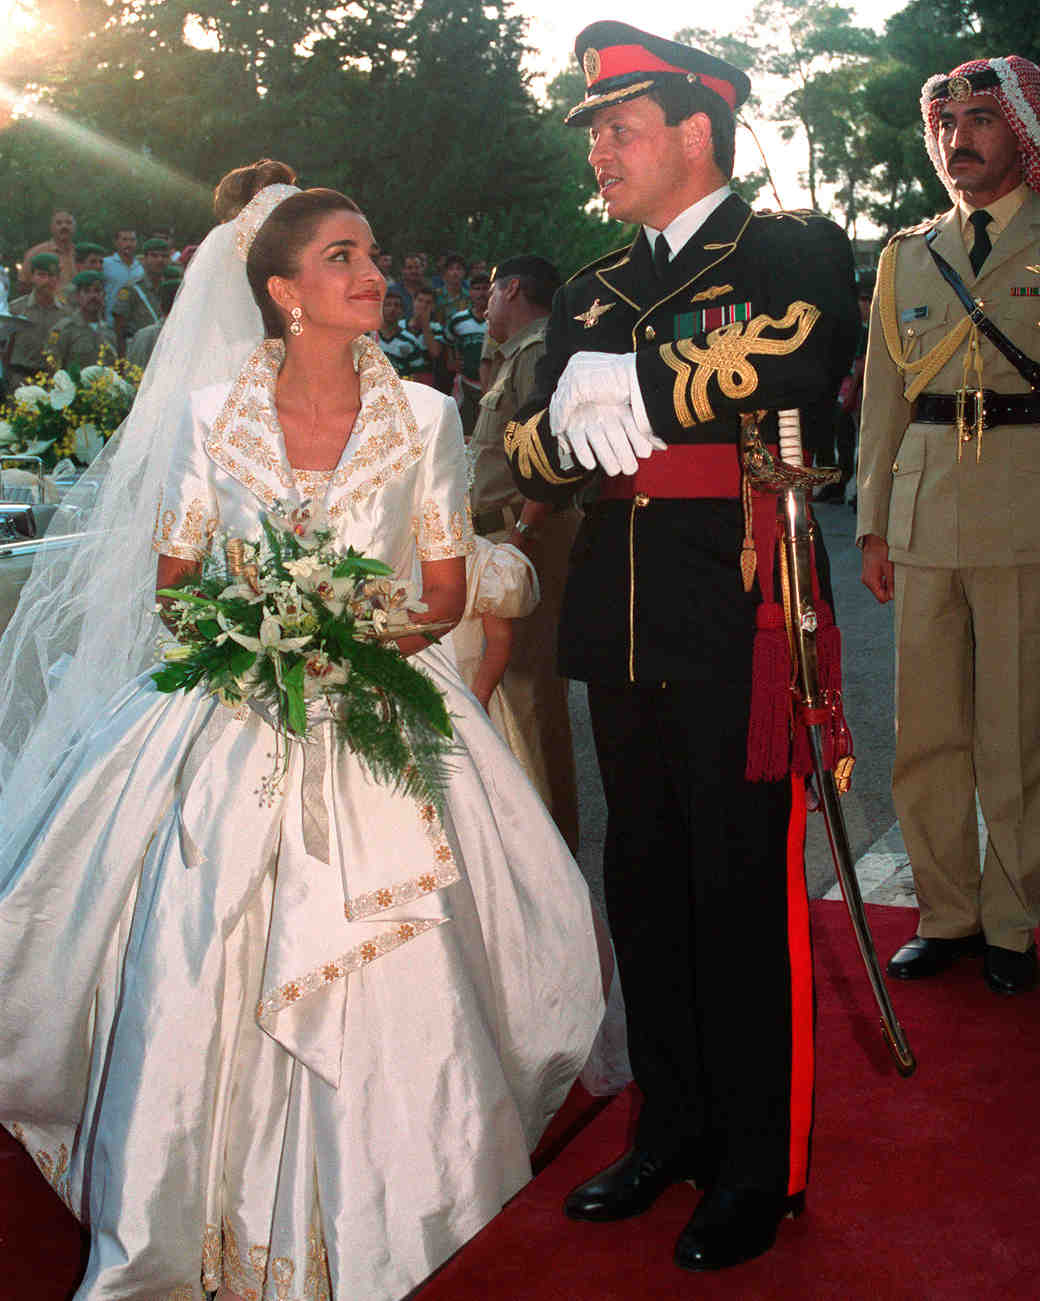 royal-wedding-dress-queen-rania-jordan-51400480-1115.jpg